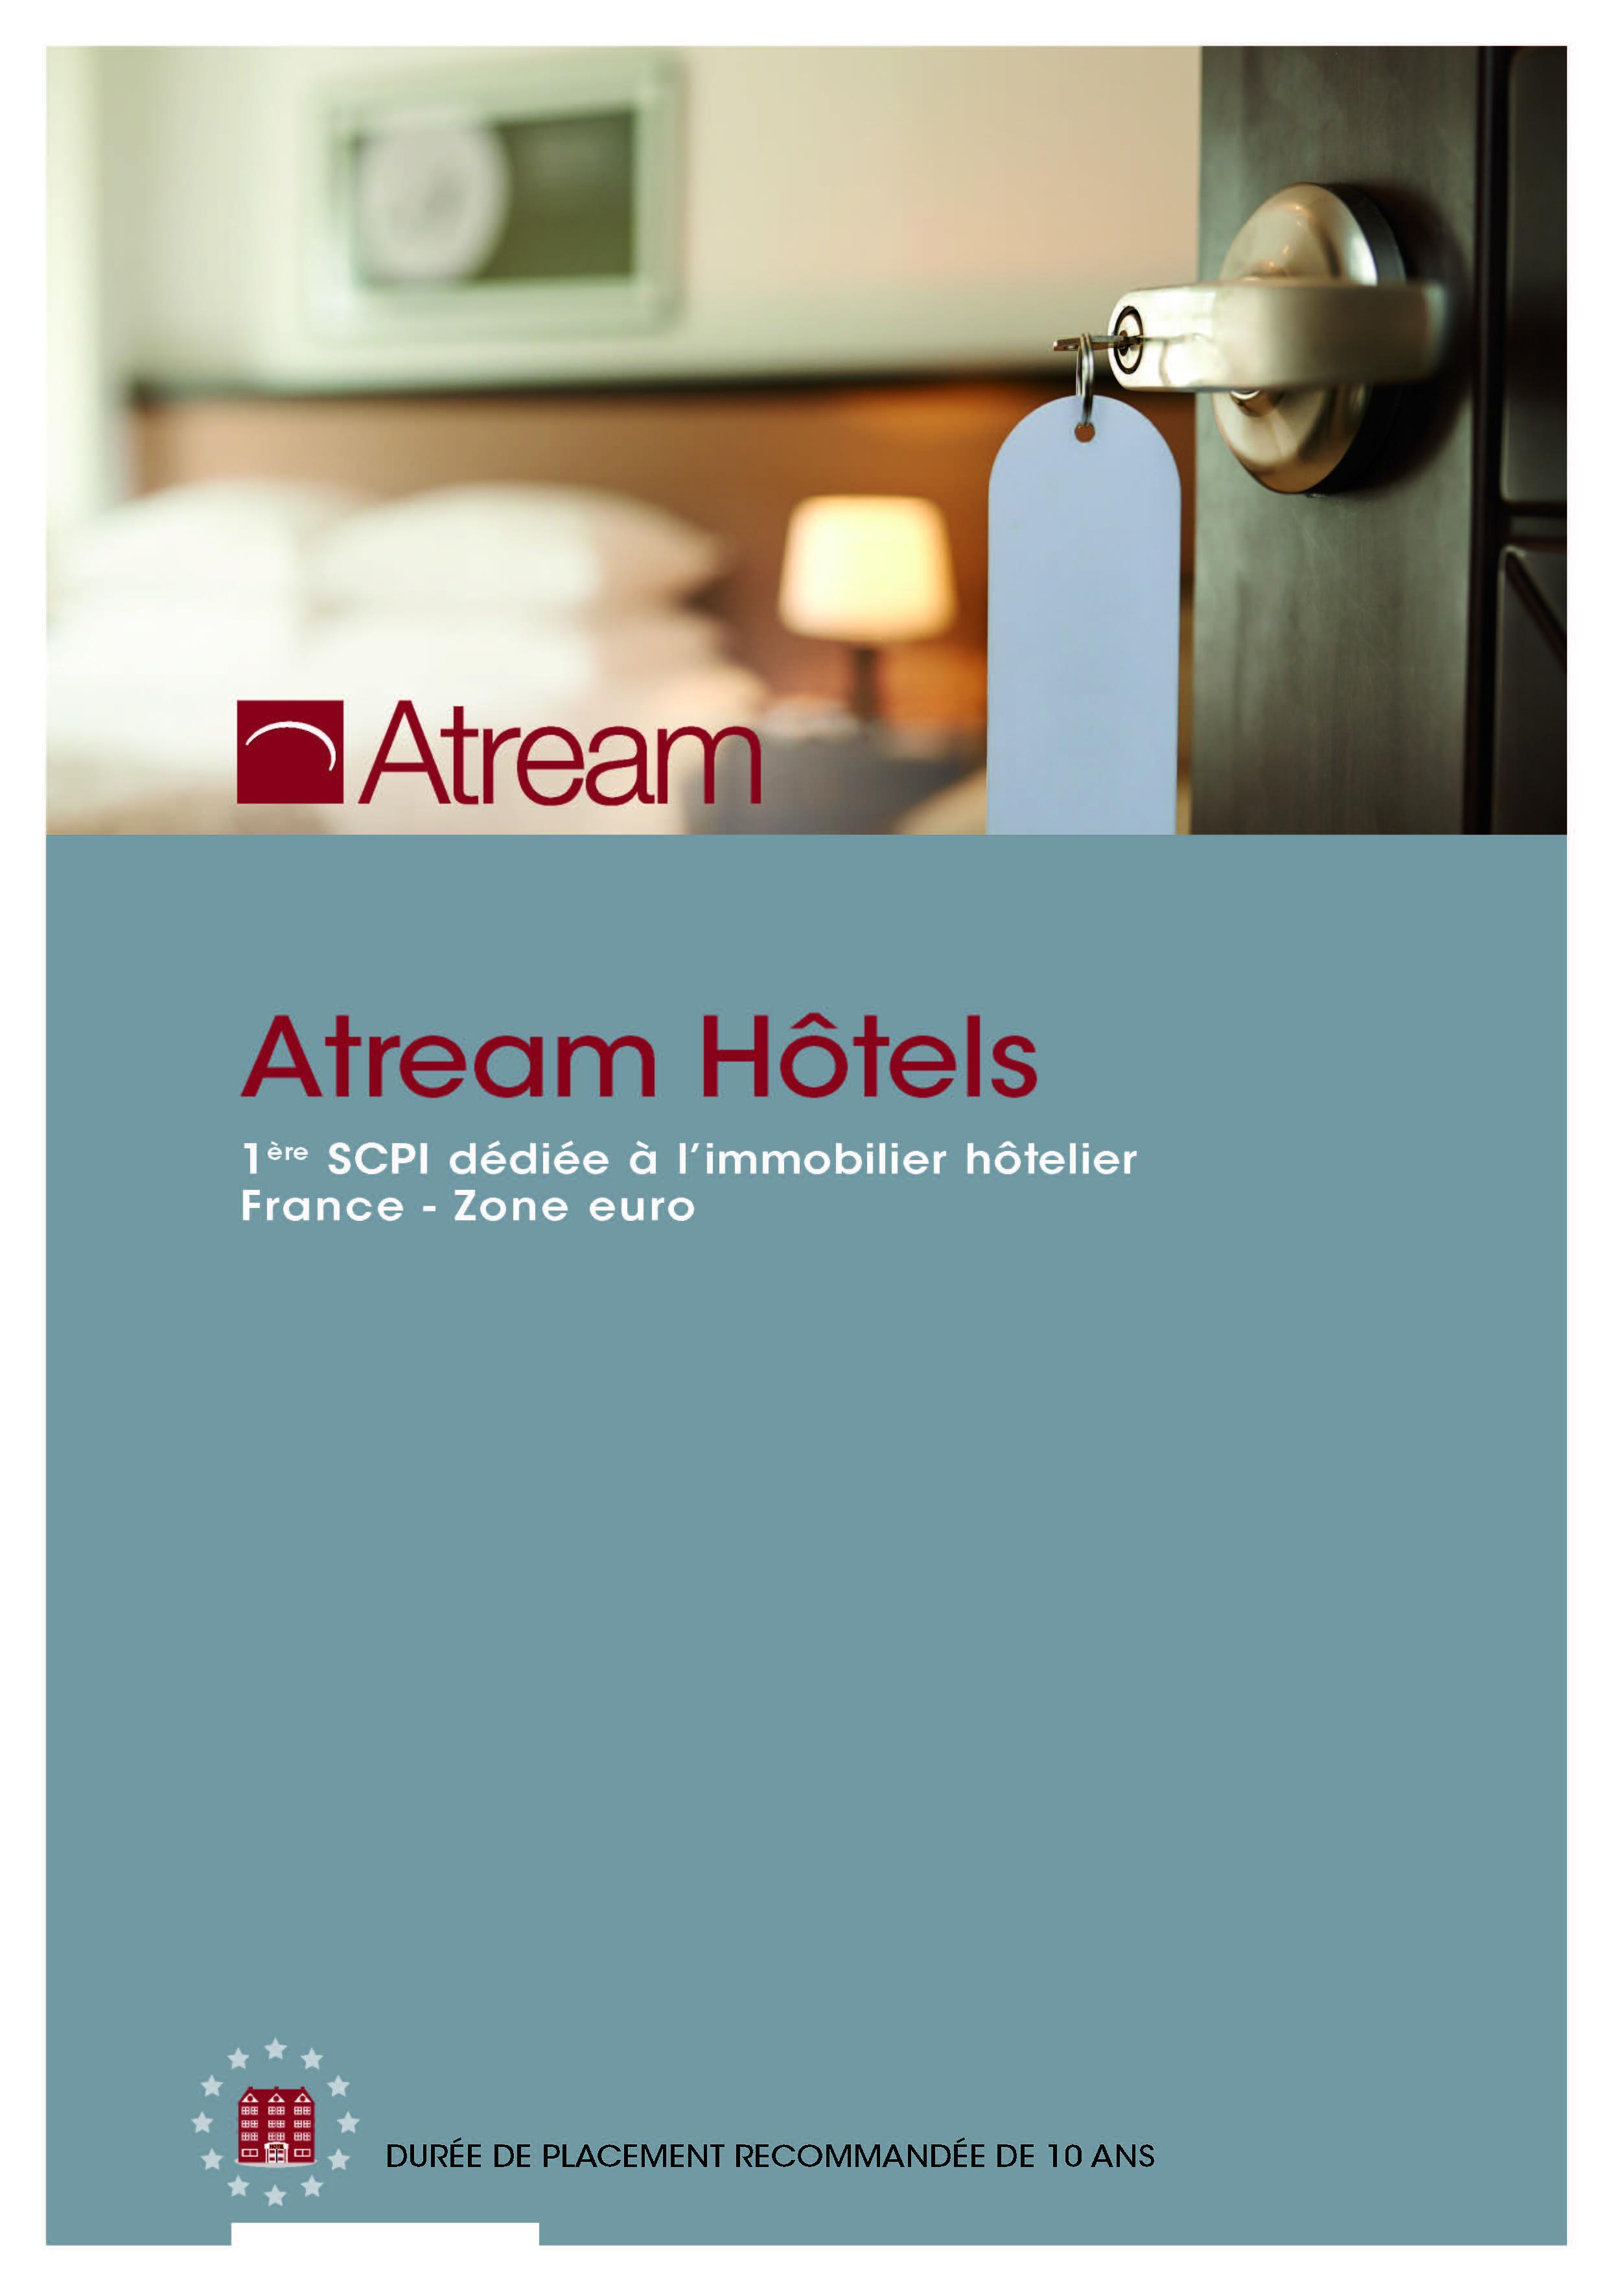 ATREAM Hotels